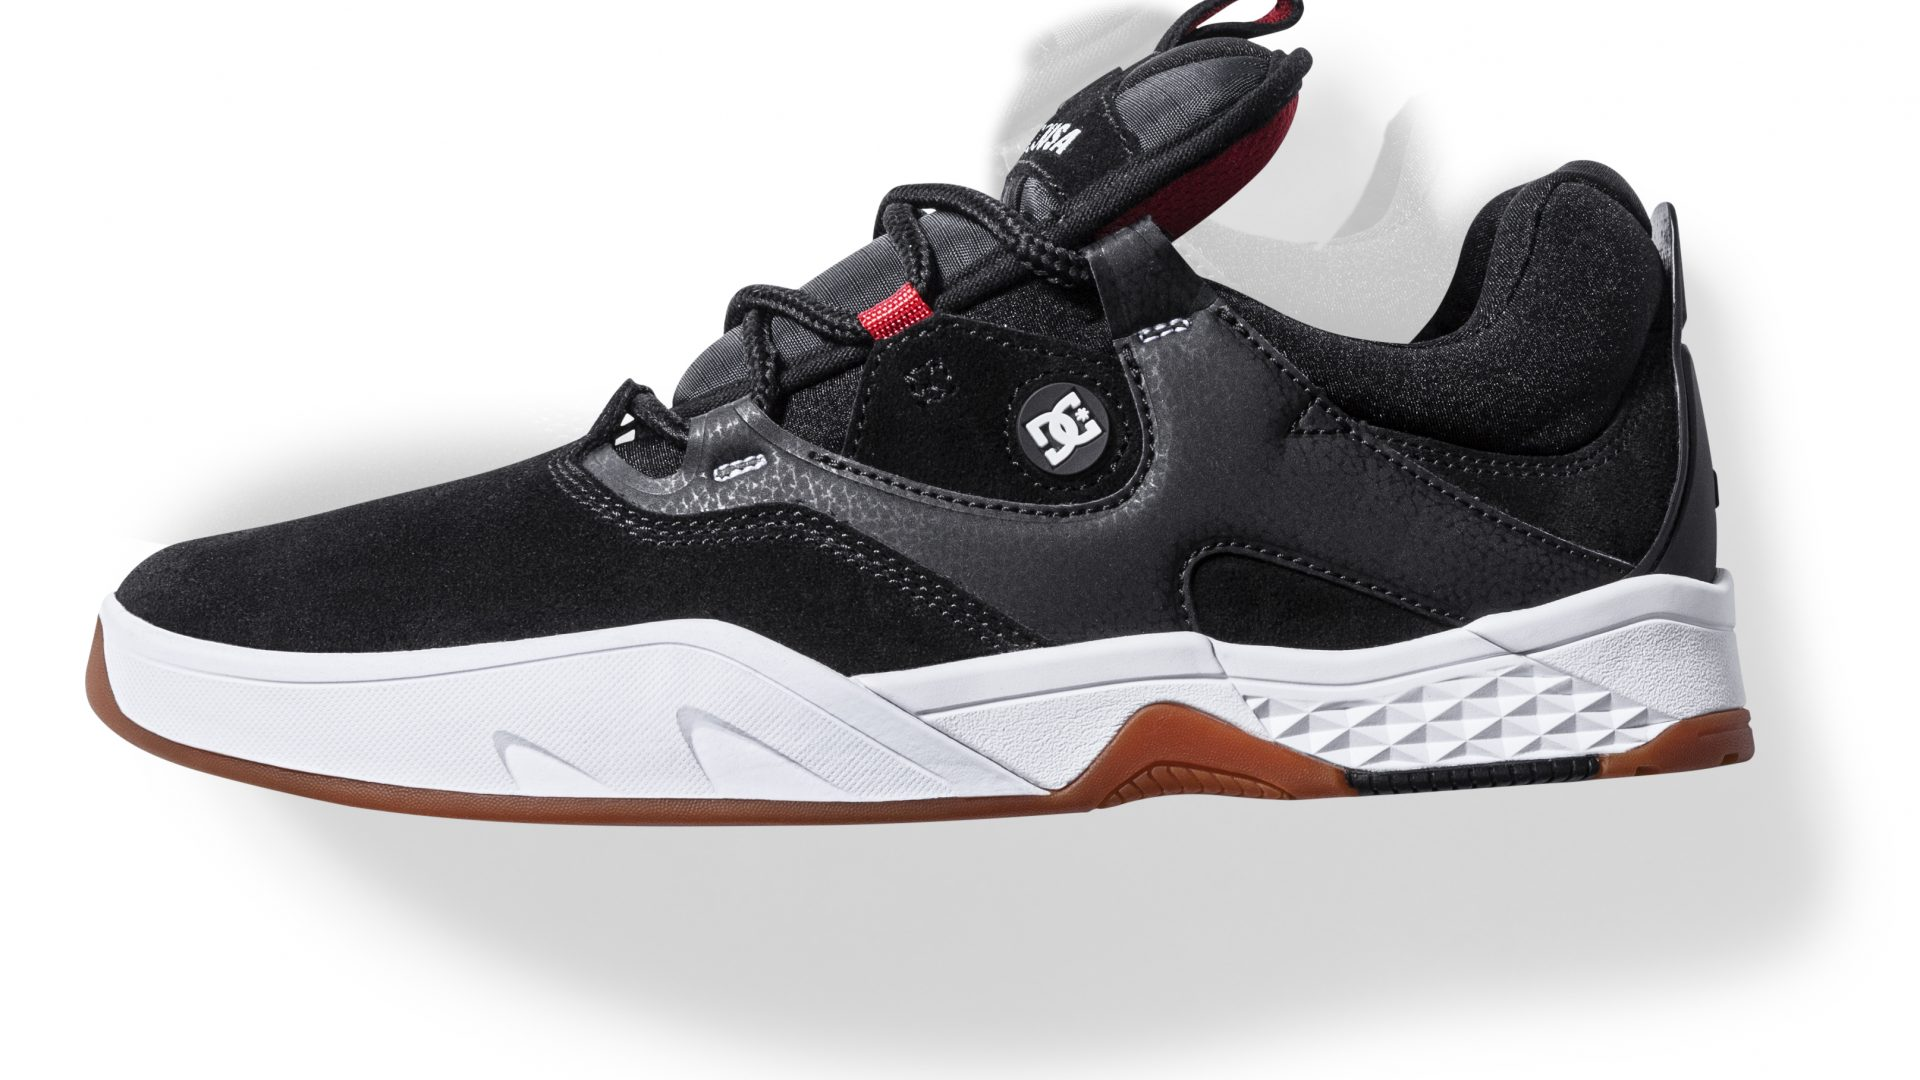 b218dab0c30 Dc Shoes Ss19 Skateboard Footwear Boardsport Source